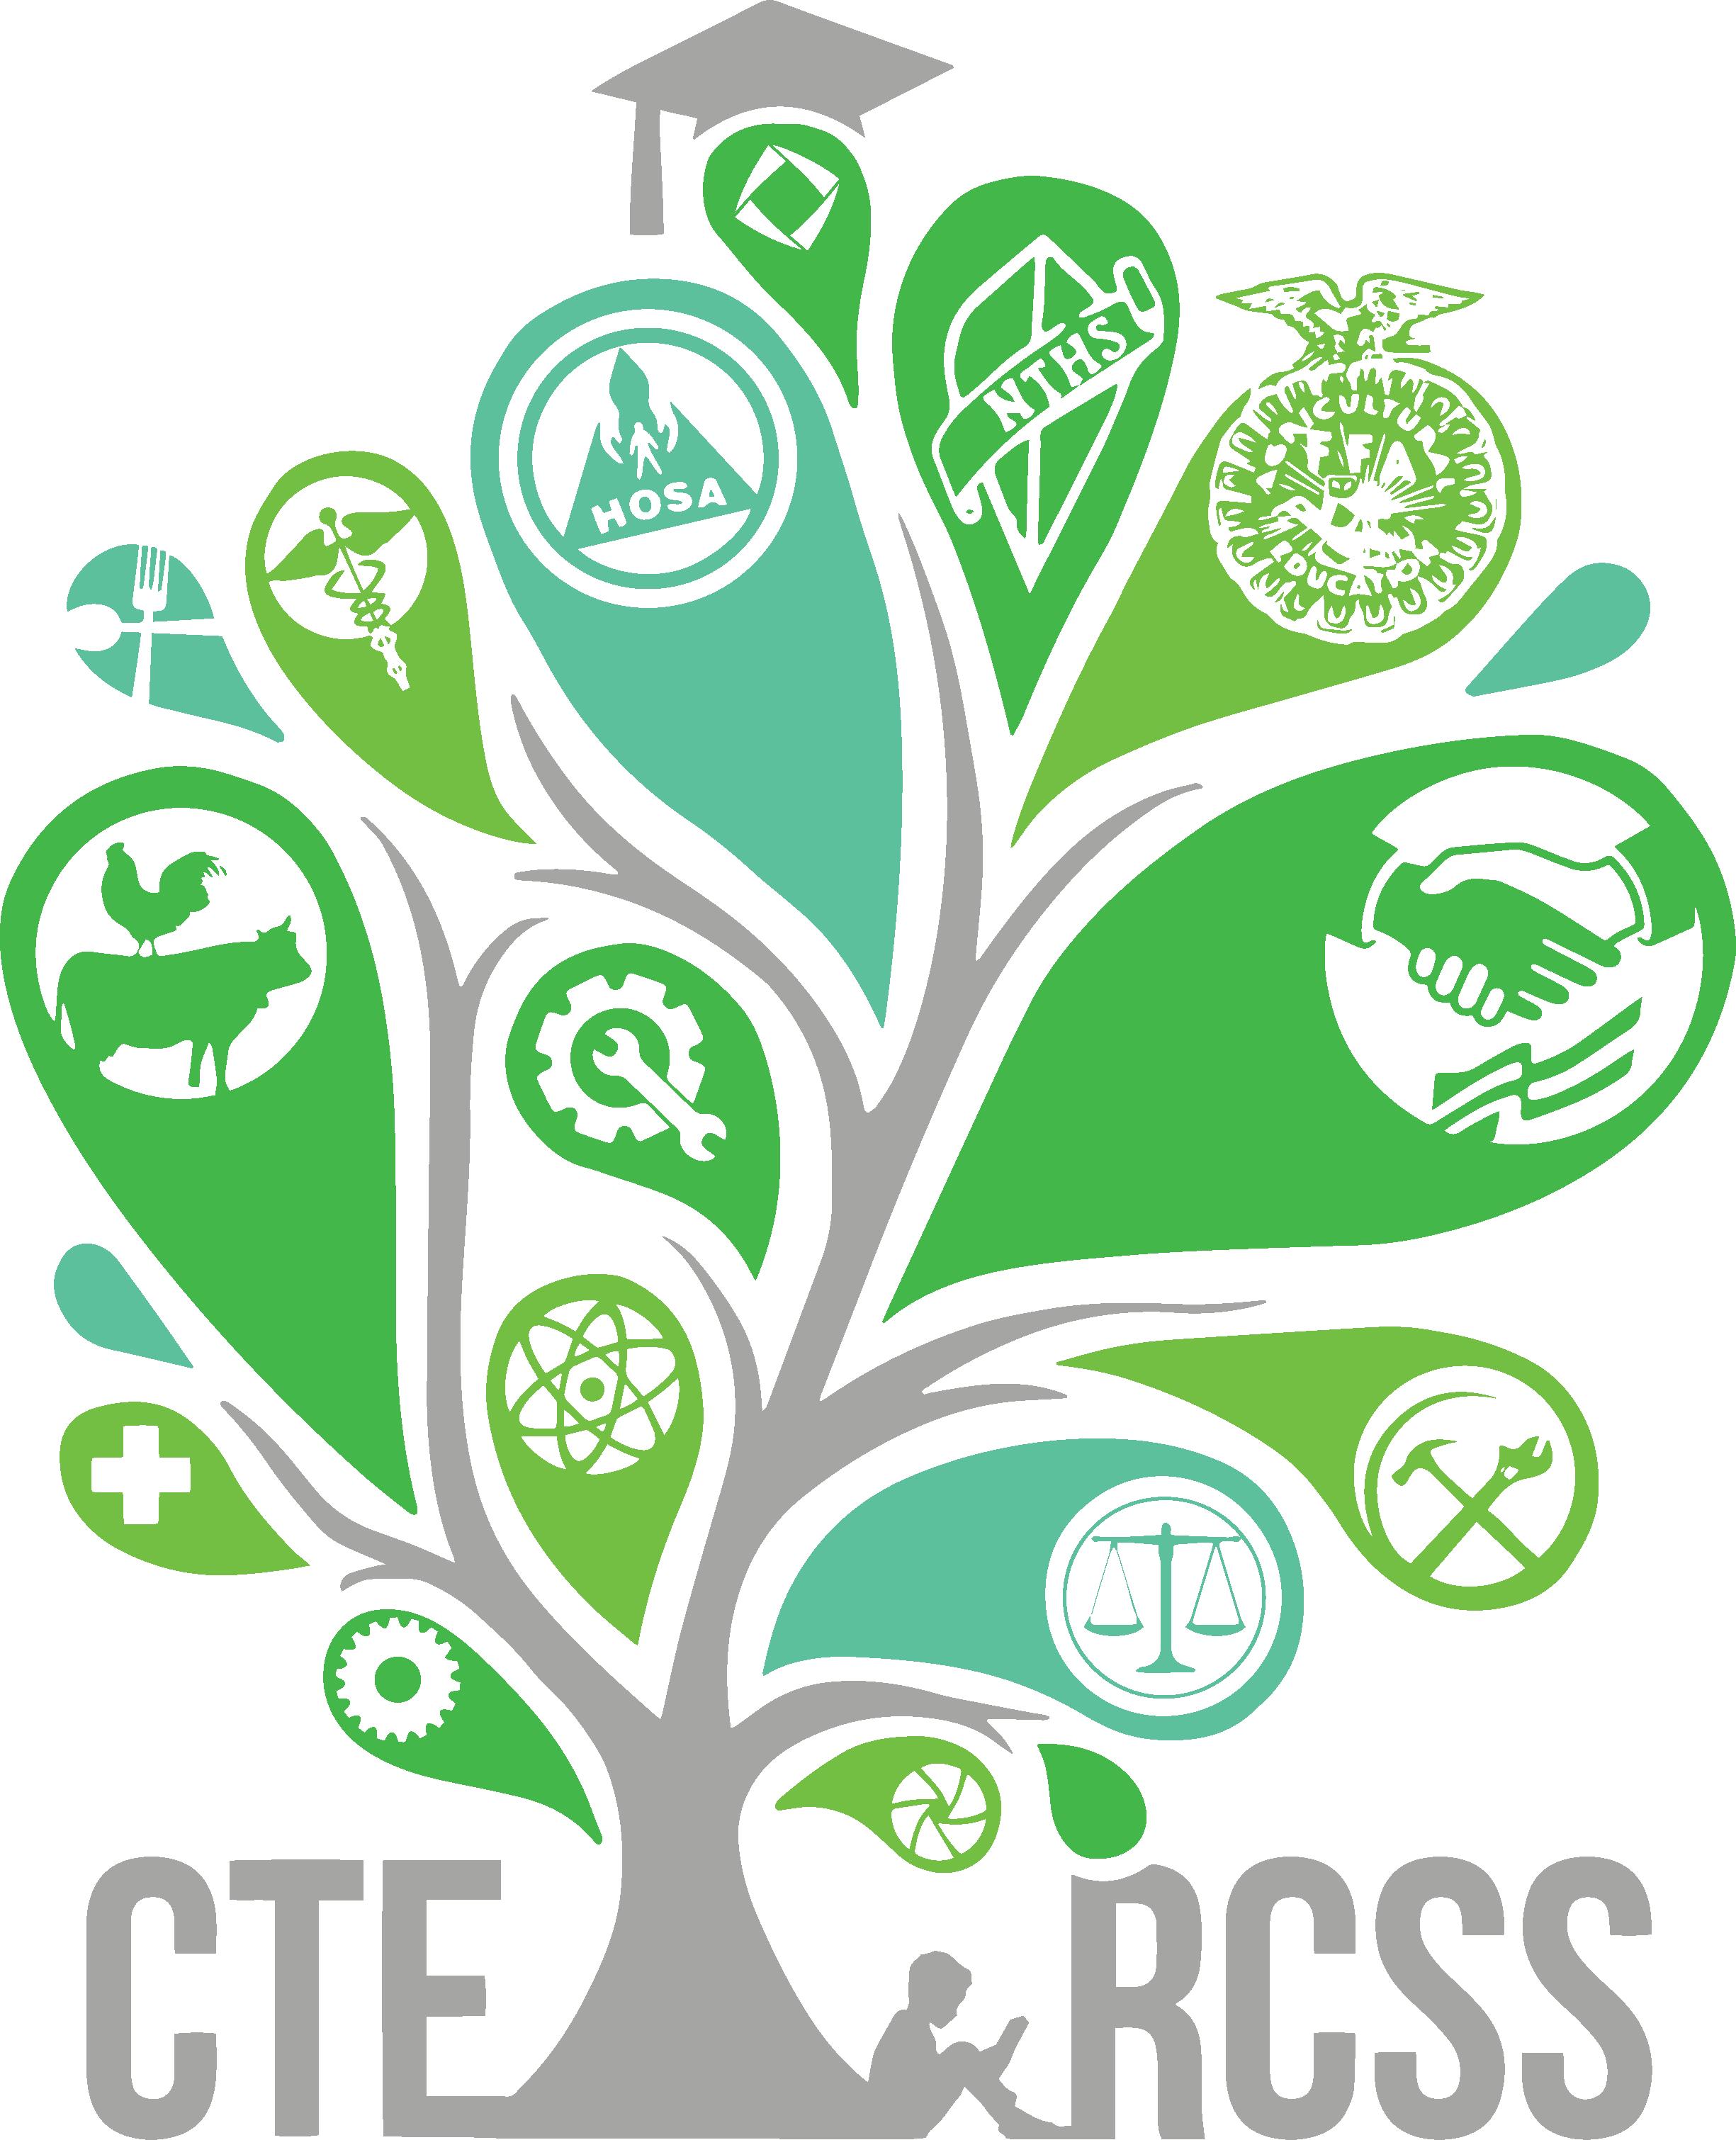 CTE LOGO tree